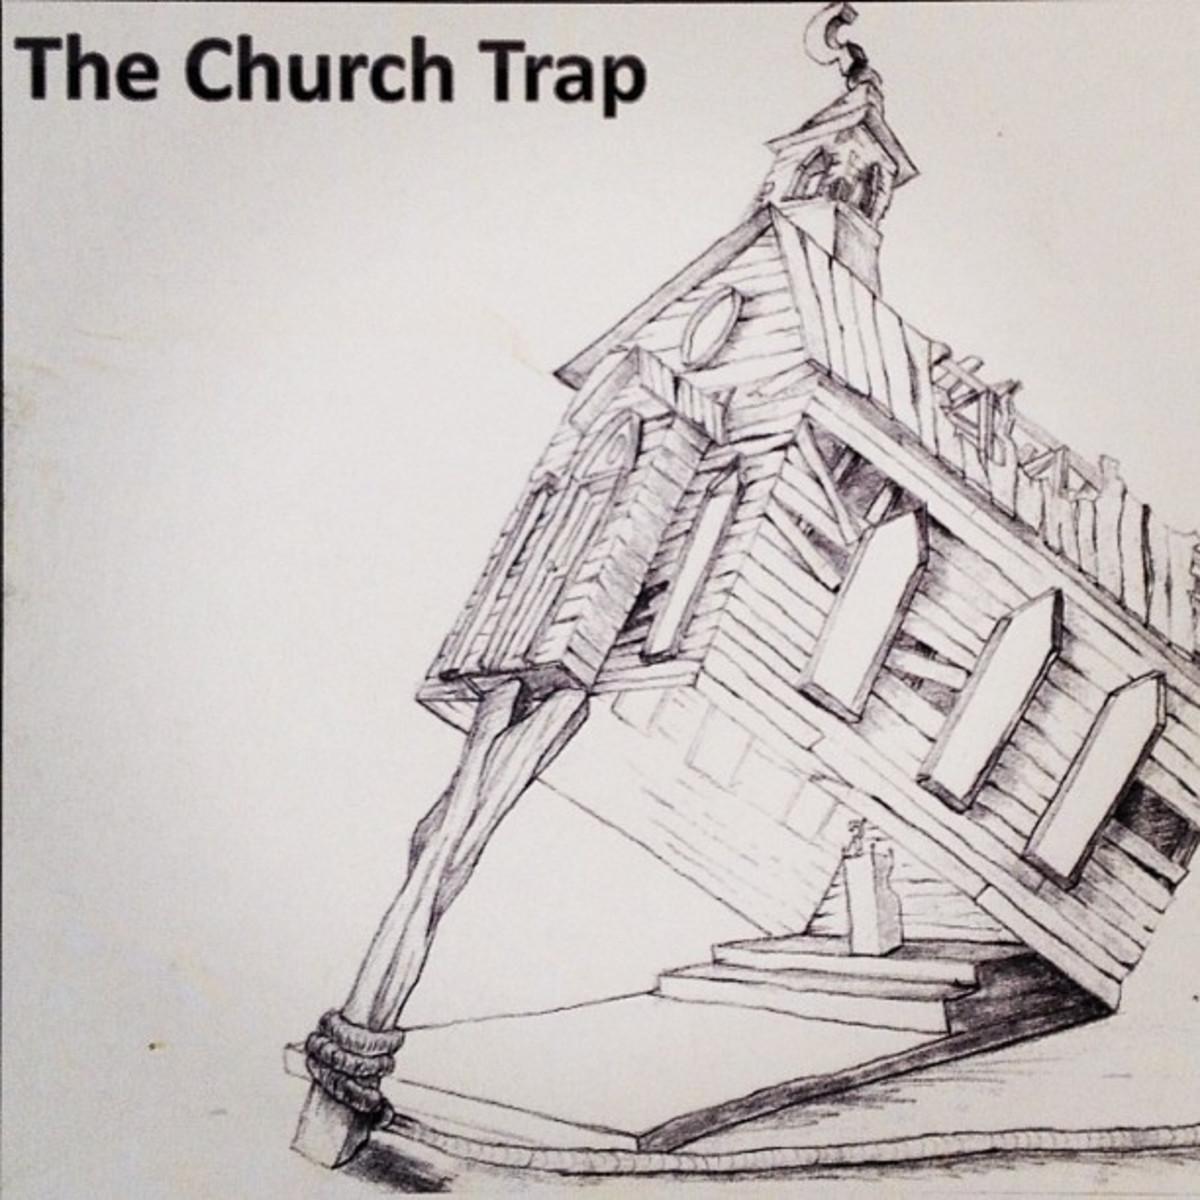 organized-religion-is-a-trap